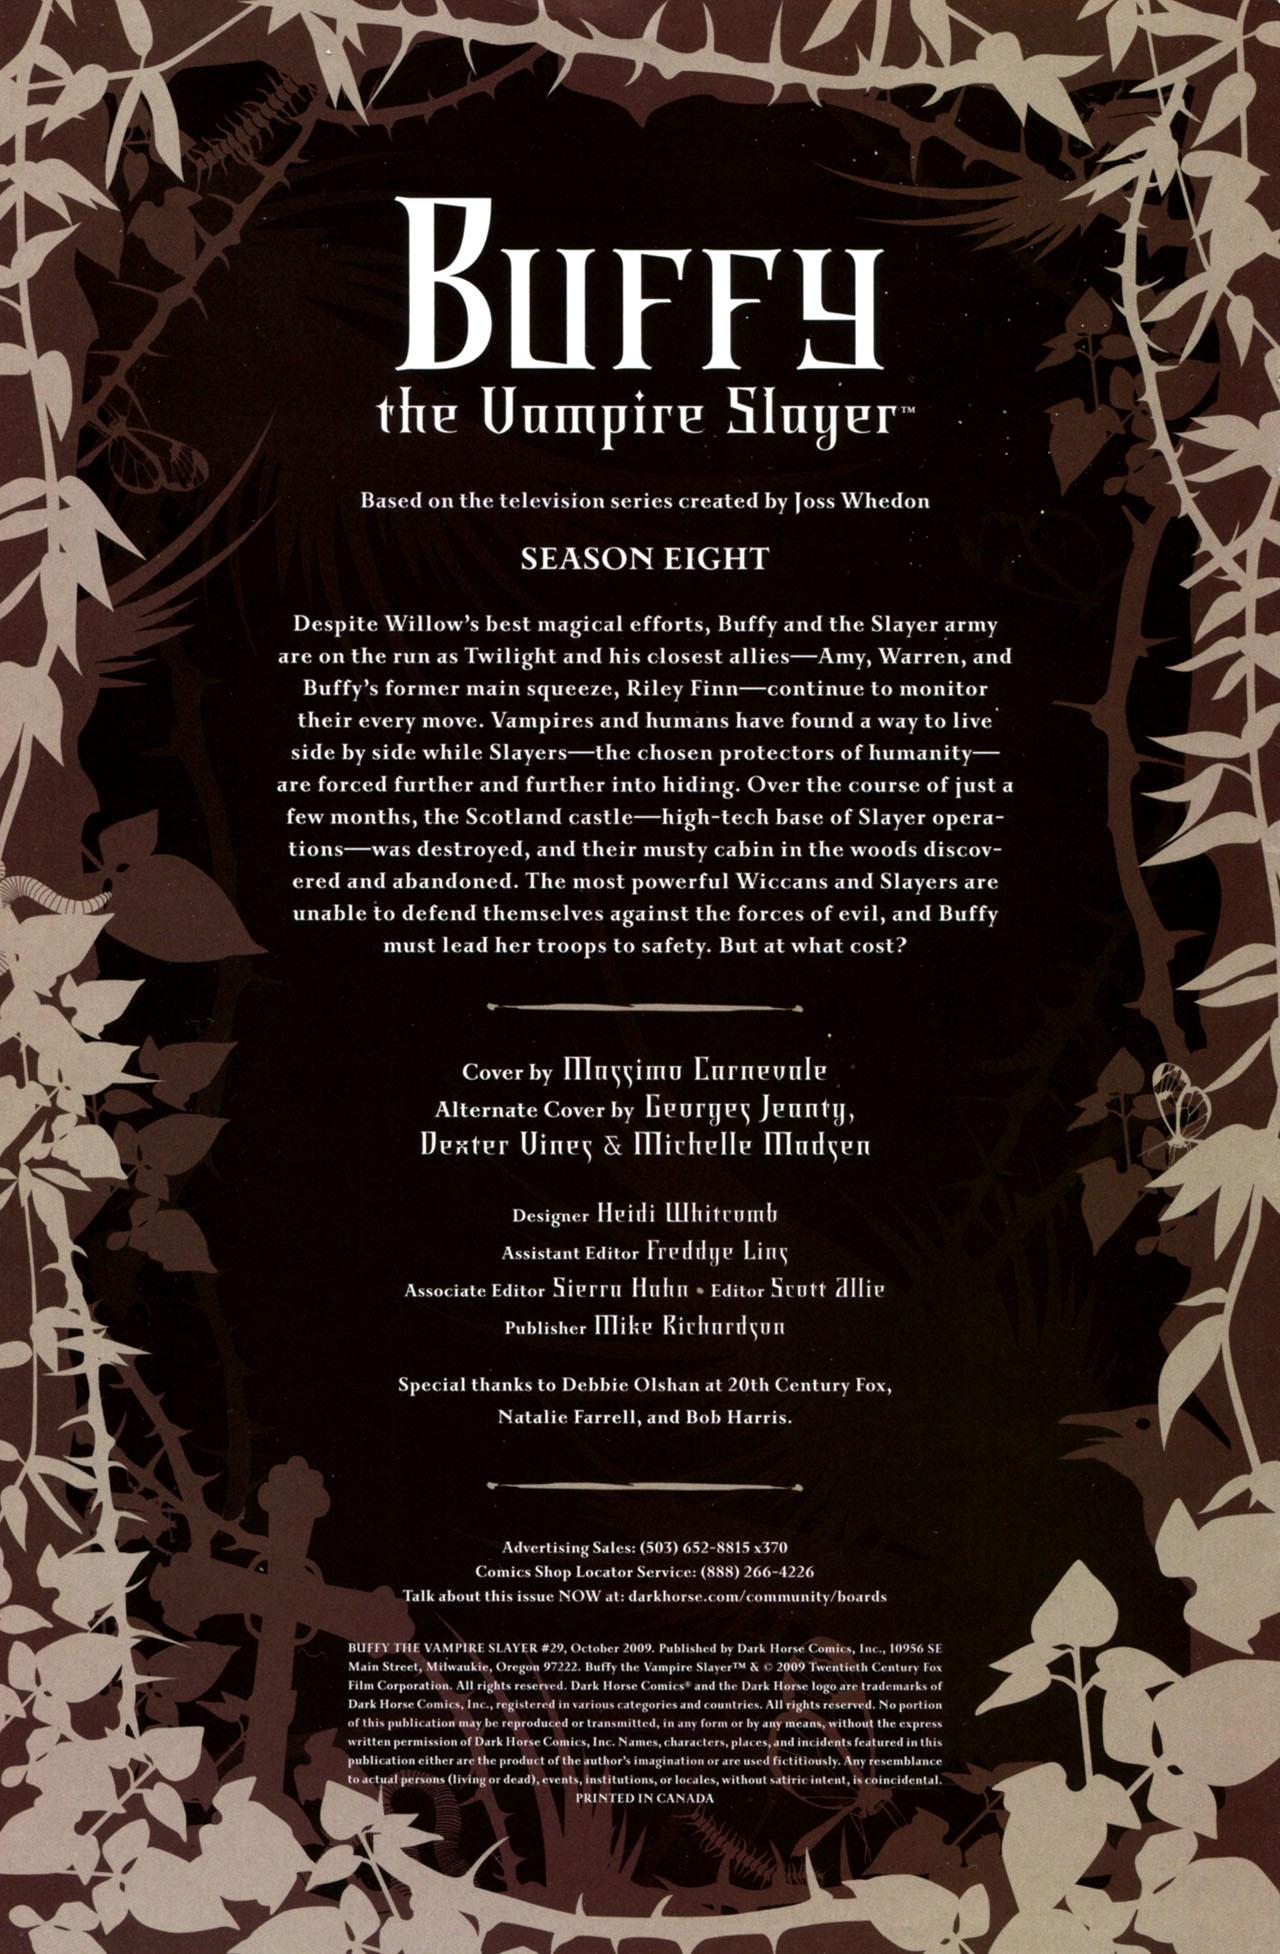 Buffy the Vampire Slayer Season Eight 29 Page 2